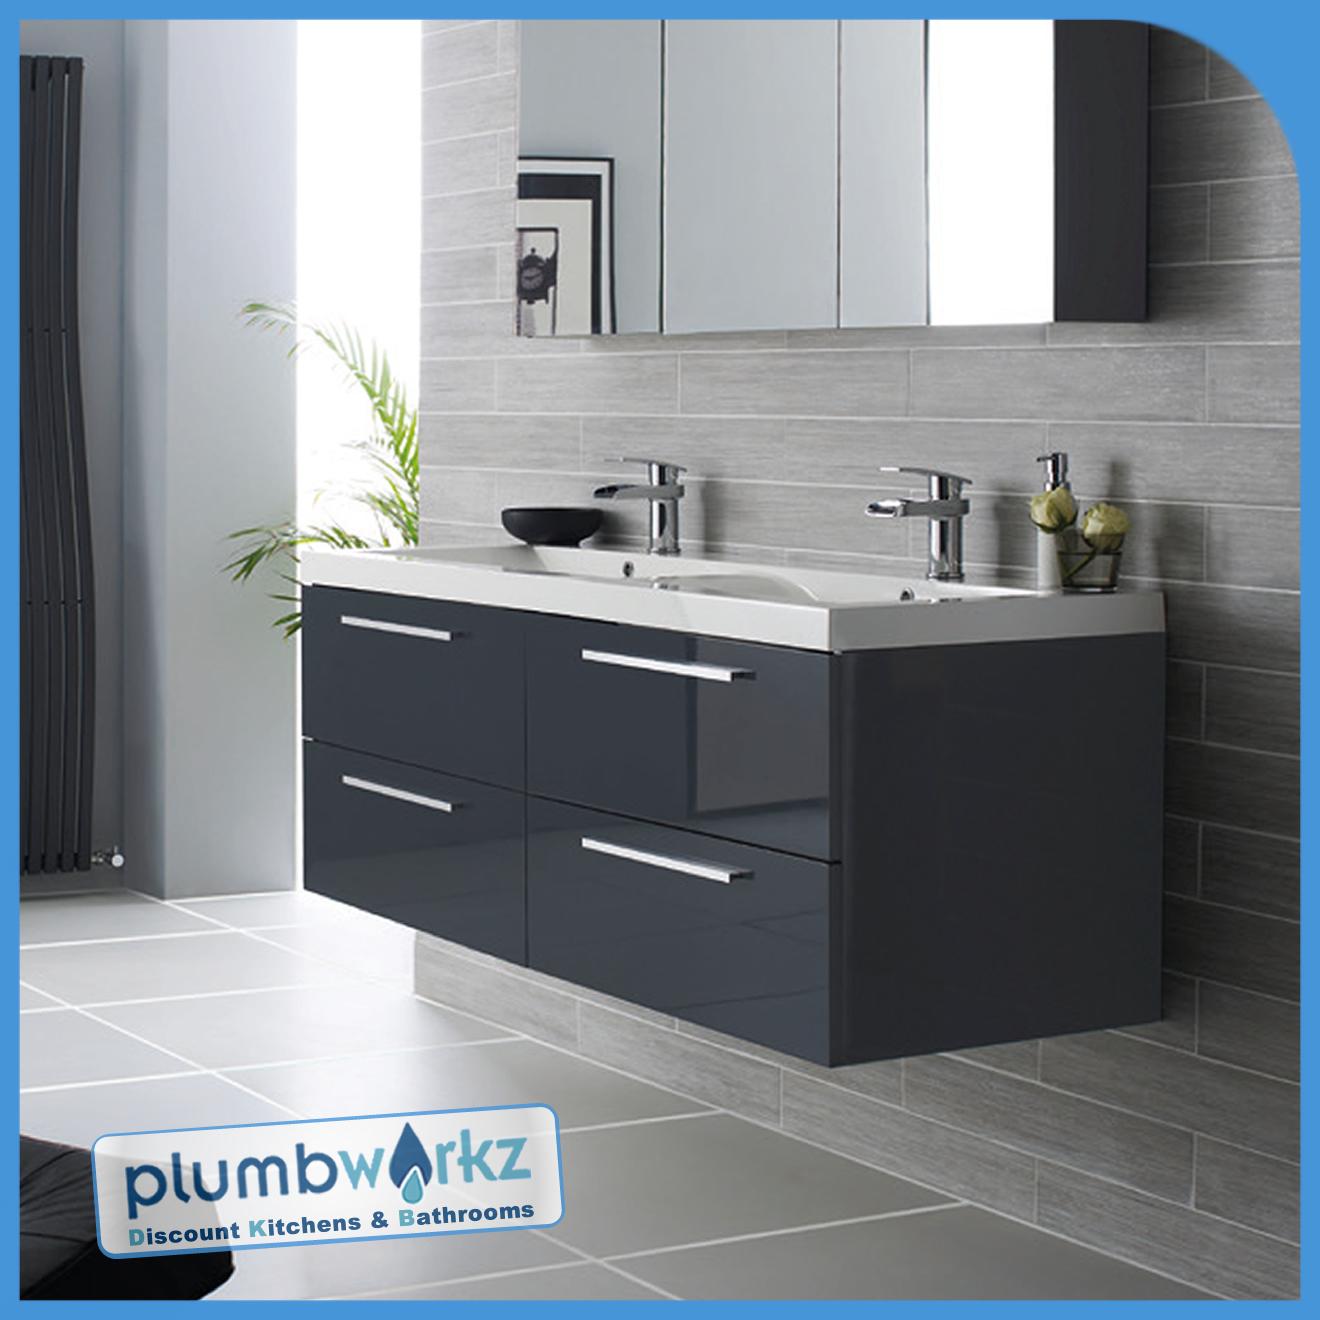 Gloss Graphite Double Basin Bathroom Vanity Unit Sink Storage Modern